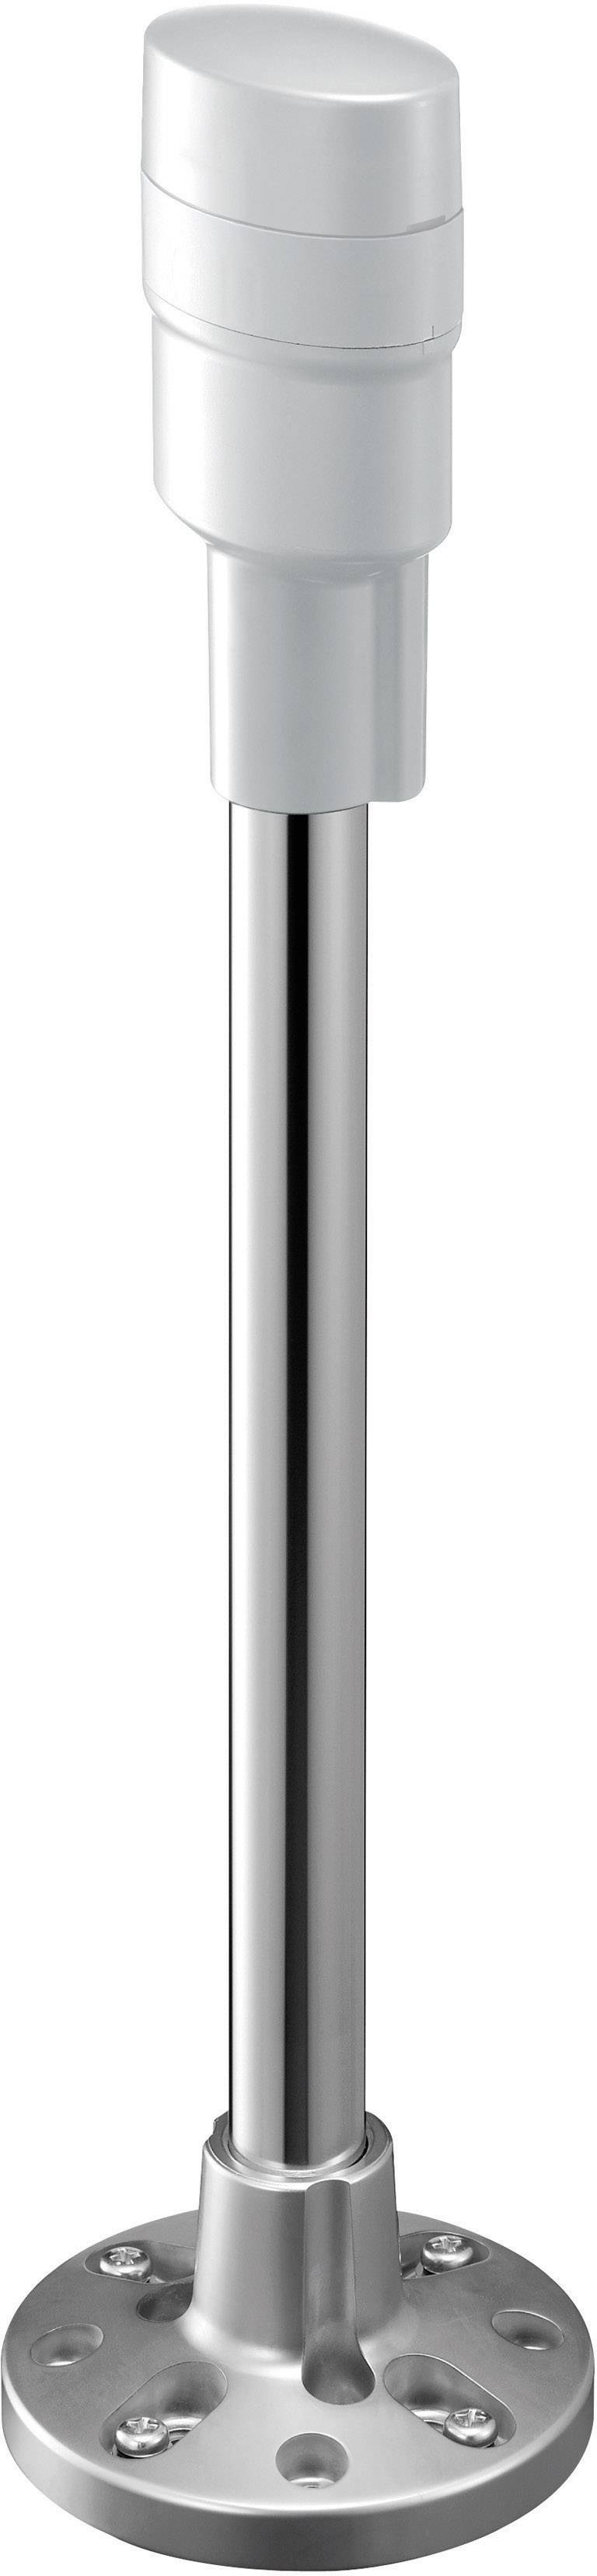 Signalizačný systém - montážna sada Idec LD6A-0PZQW